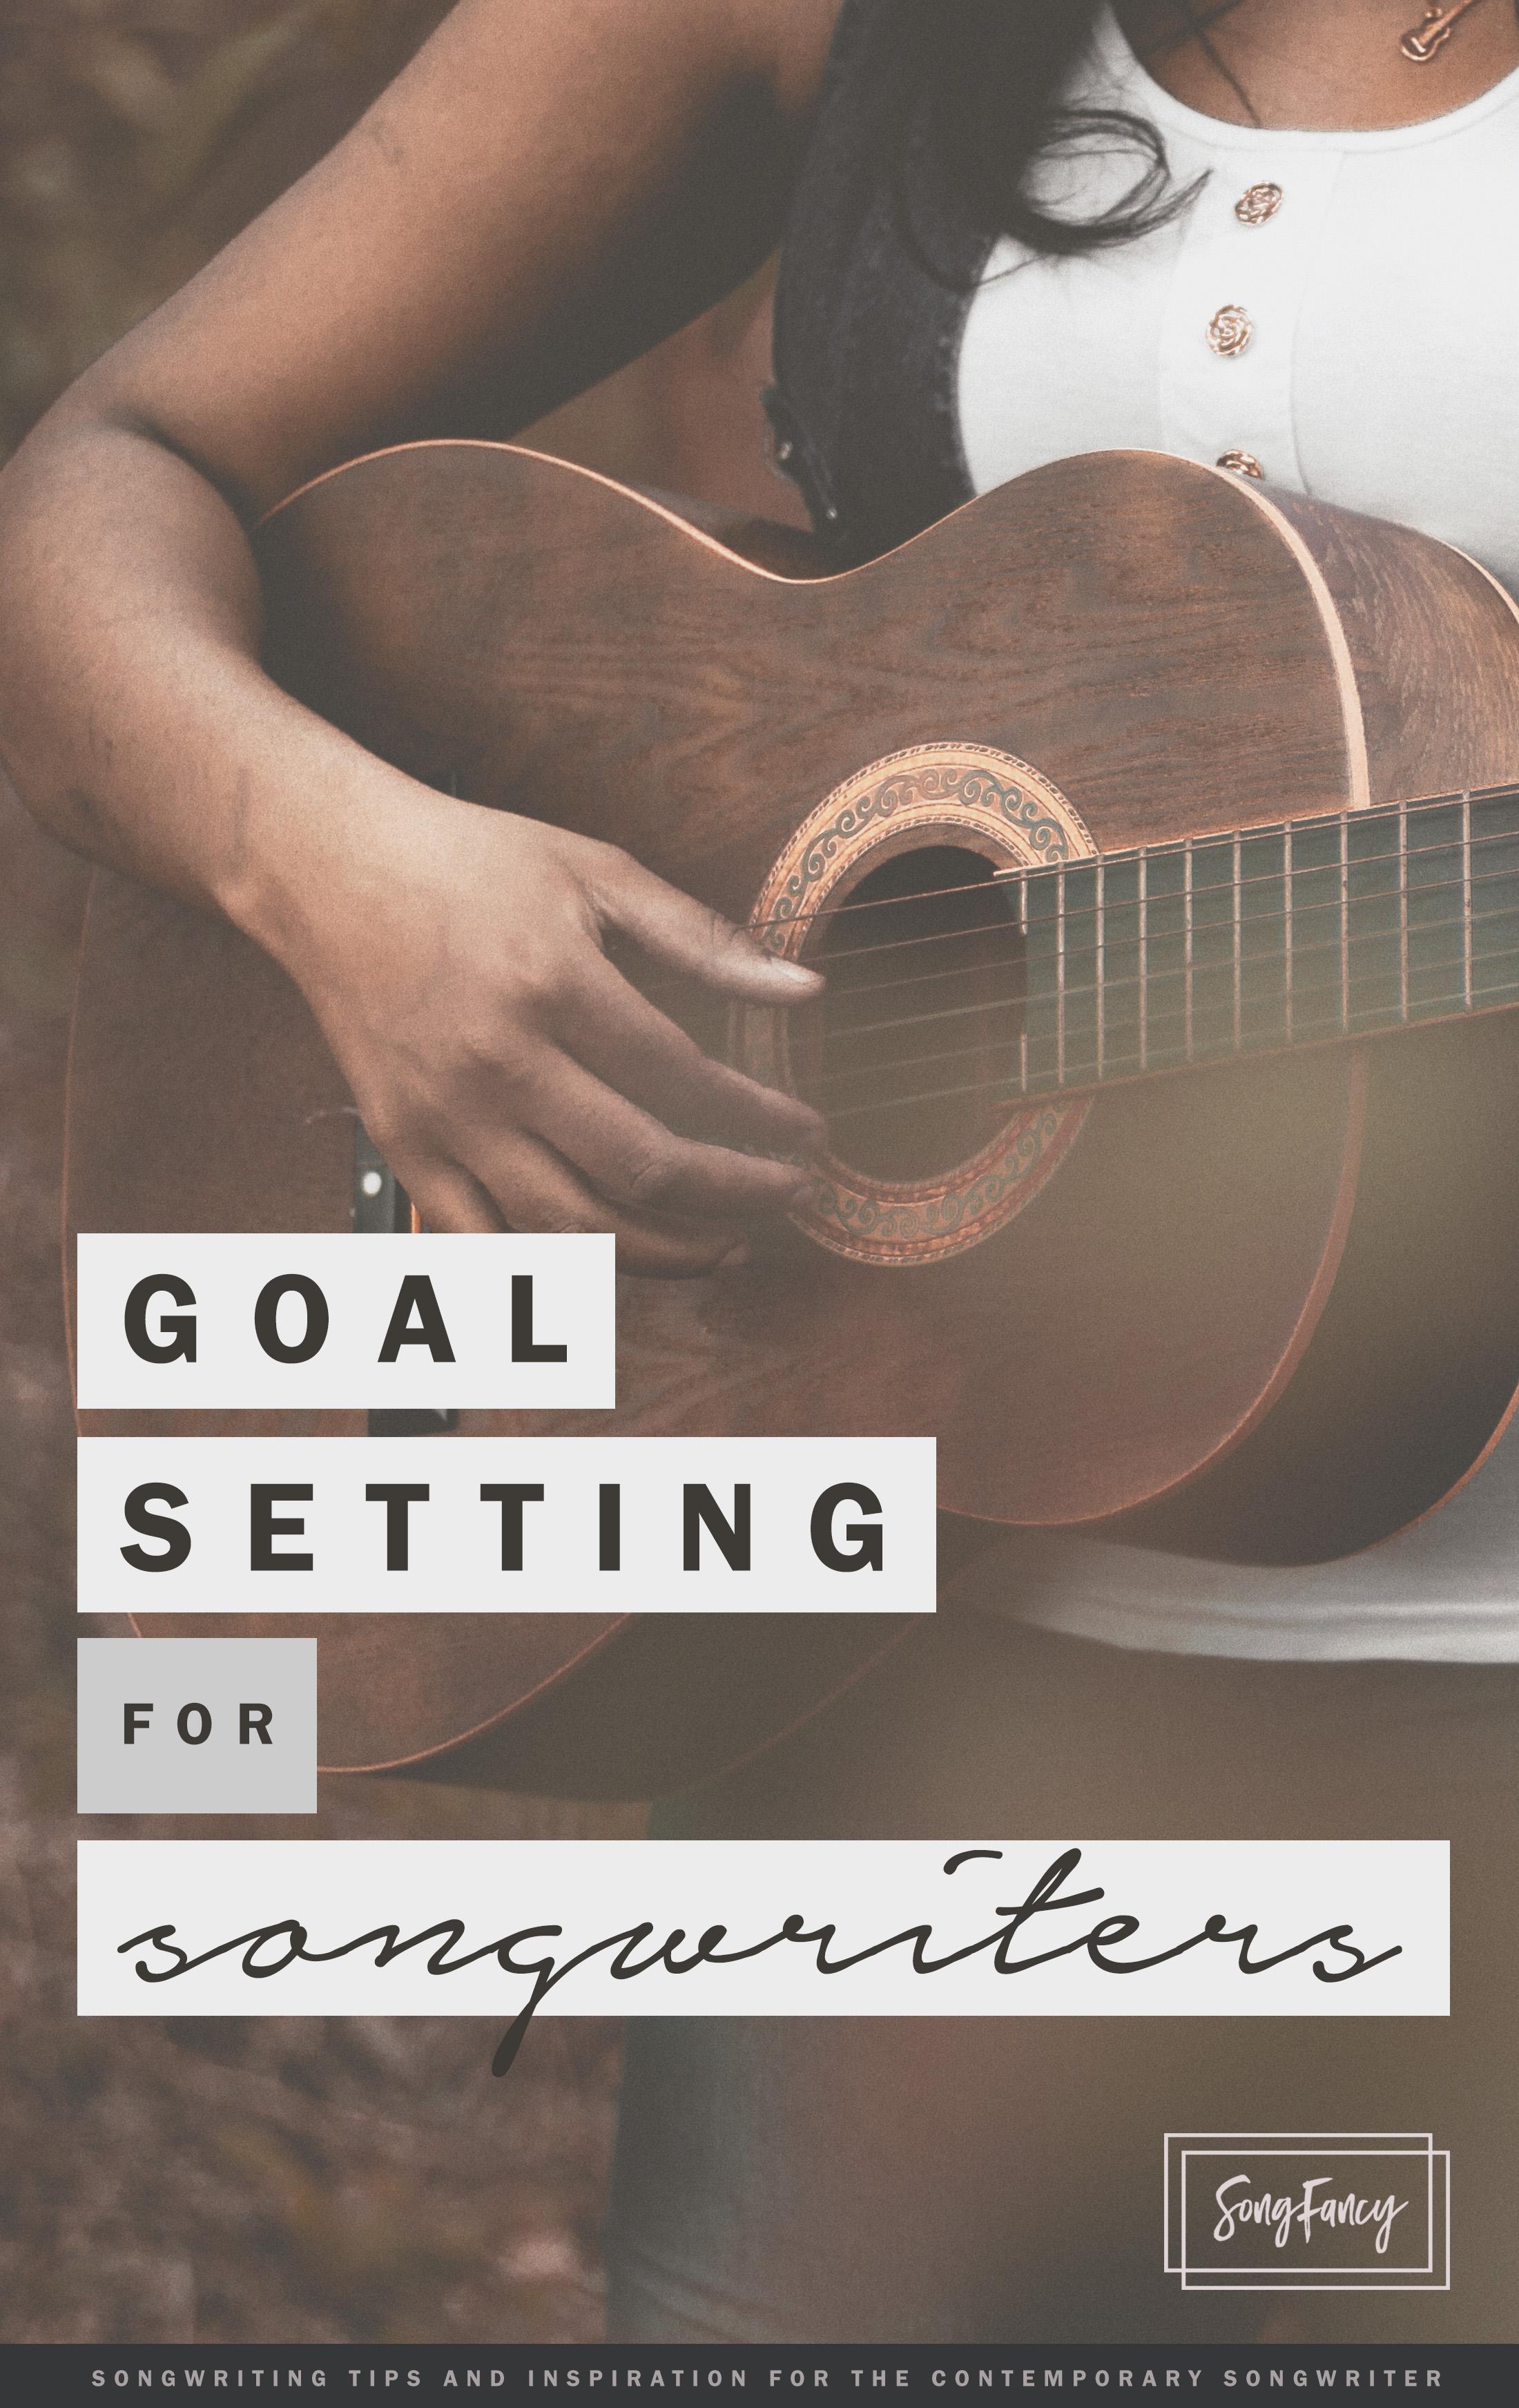 We've got big dreams. Let's get them down on paper and start making them happen. Read on. | SongFancy.com